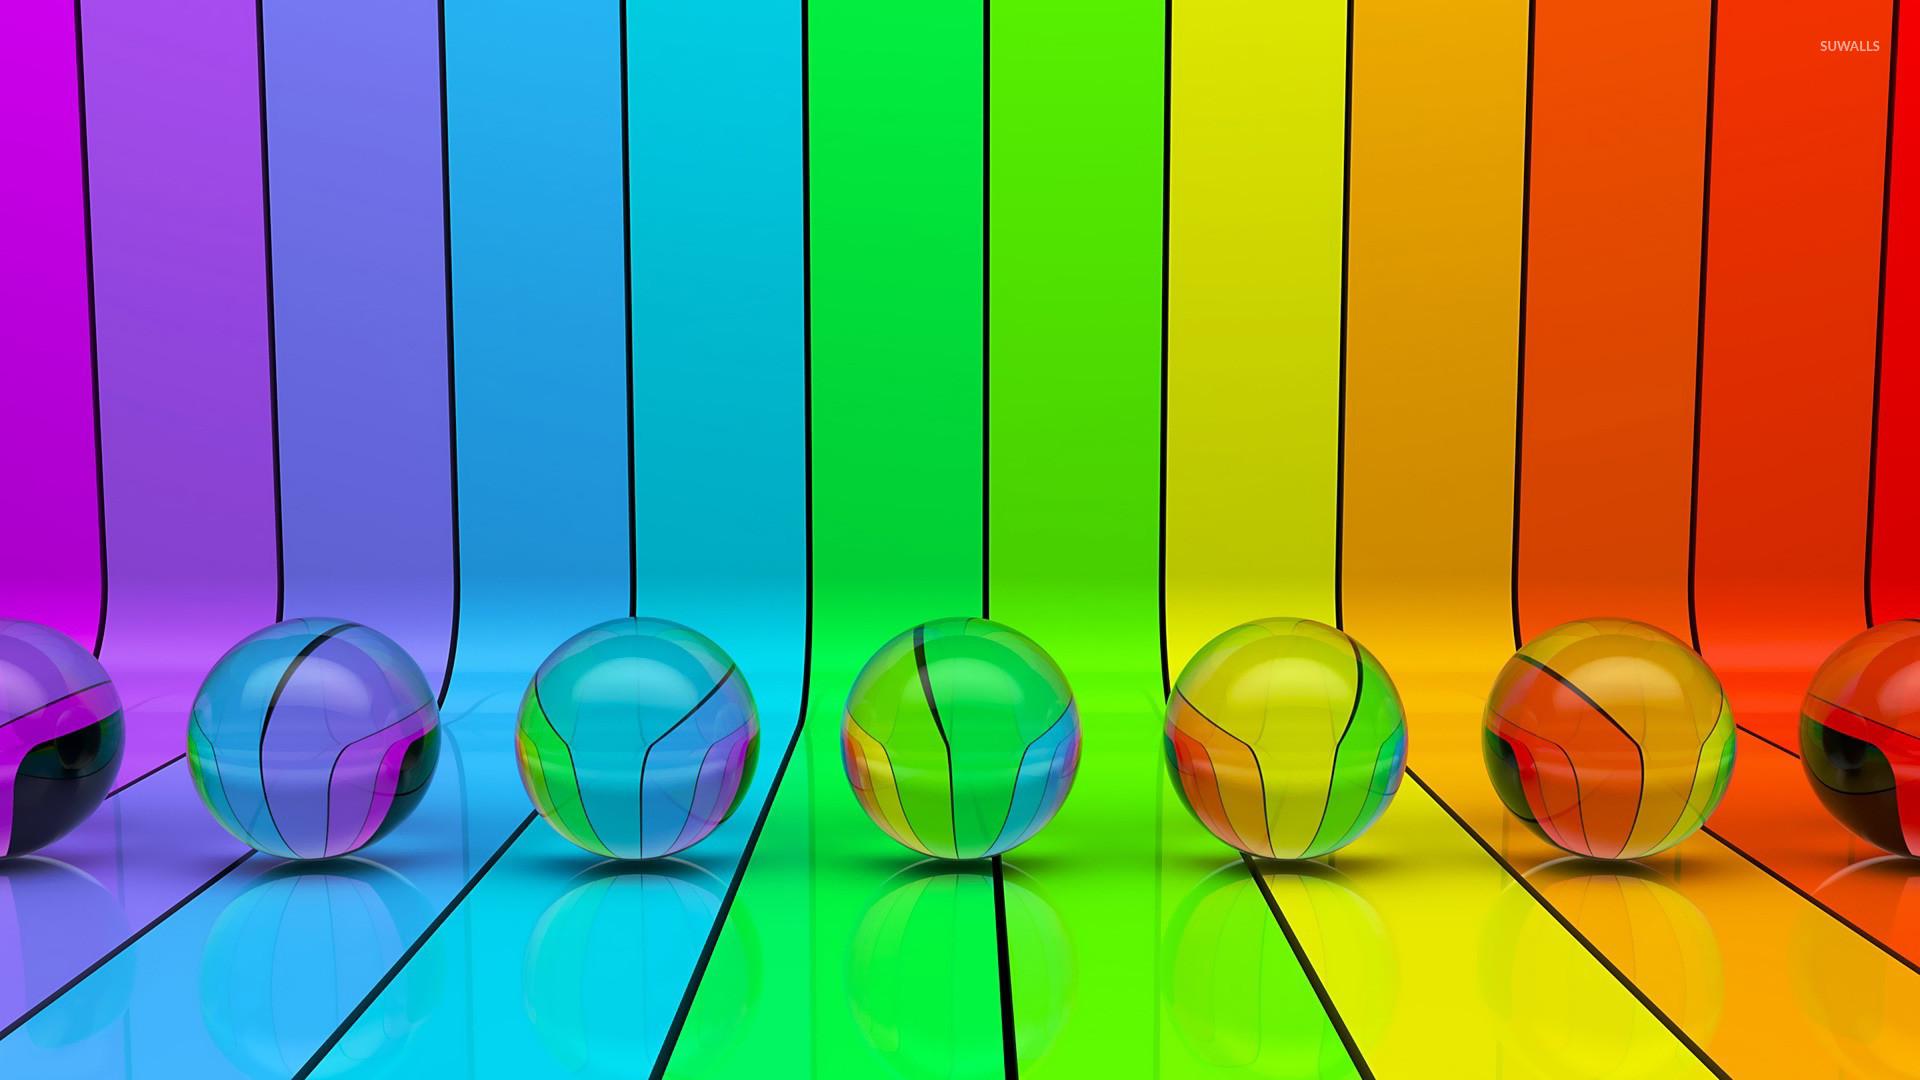 Res: 1920x1080, Transparent spheres on rainbow stripes wallpaper